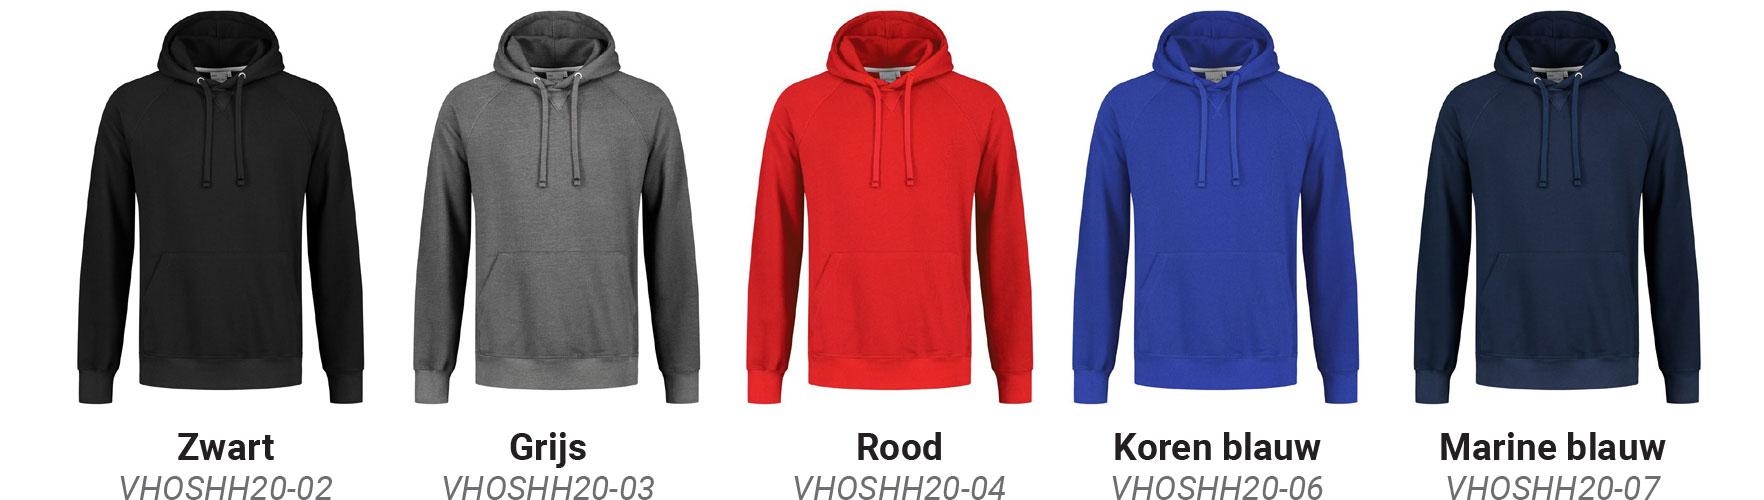 KCC Custom vrijetijdskleding hoodie